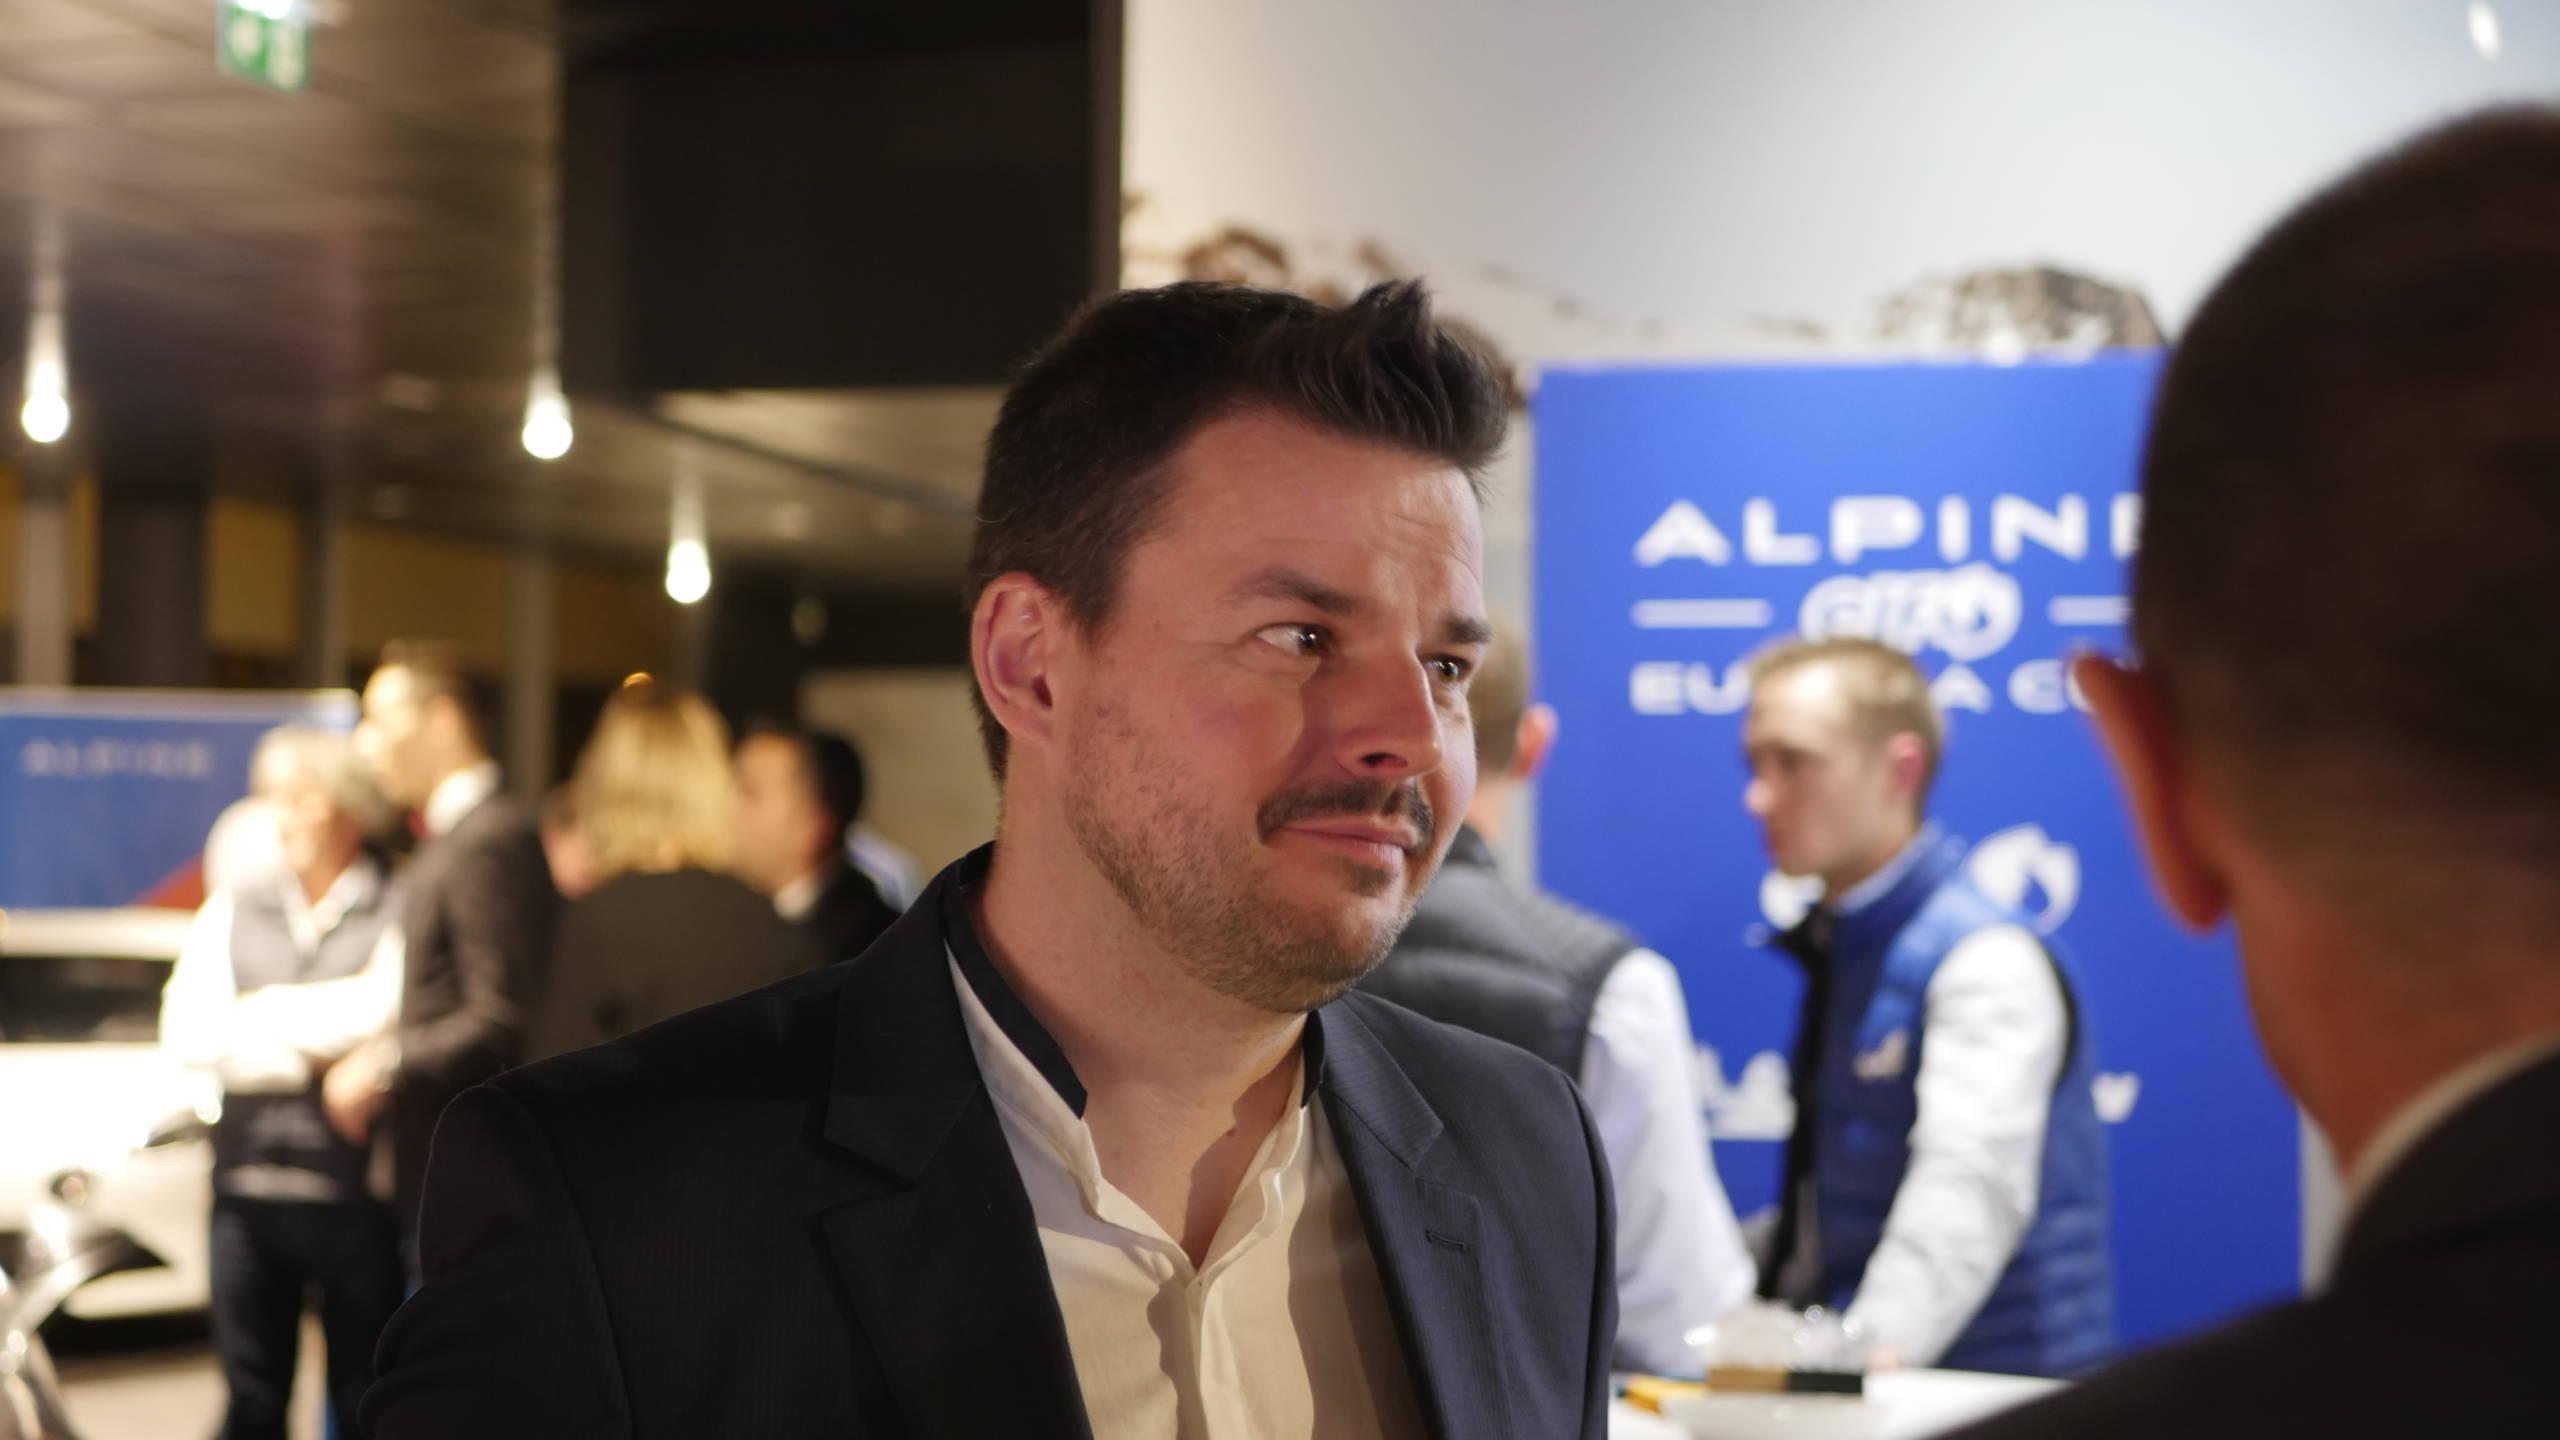 Soirée Alpine Elf Europa Cup 2018 récompense Showroom CMR 20 | Alpine Elf Europa Cup: par ici le programme 2019 !